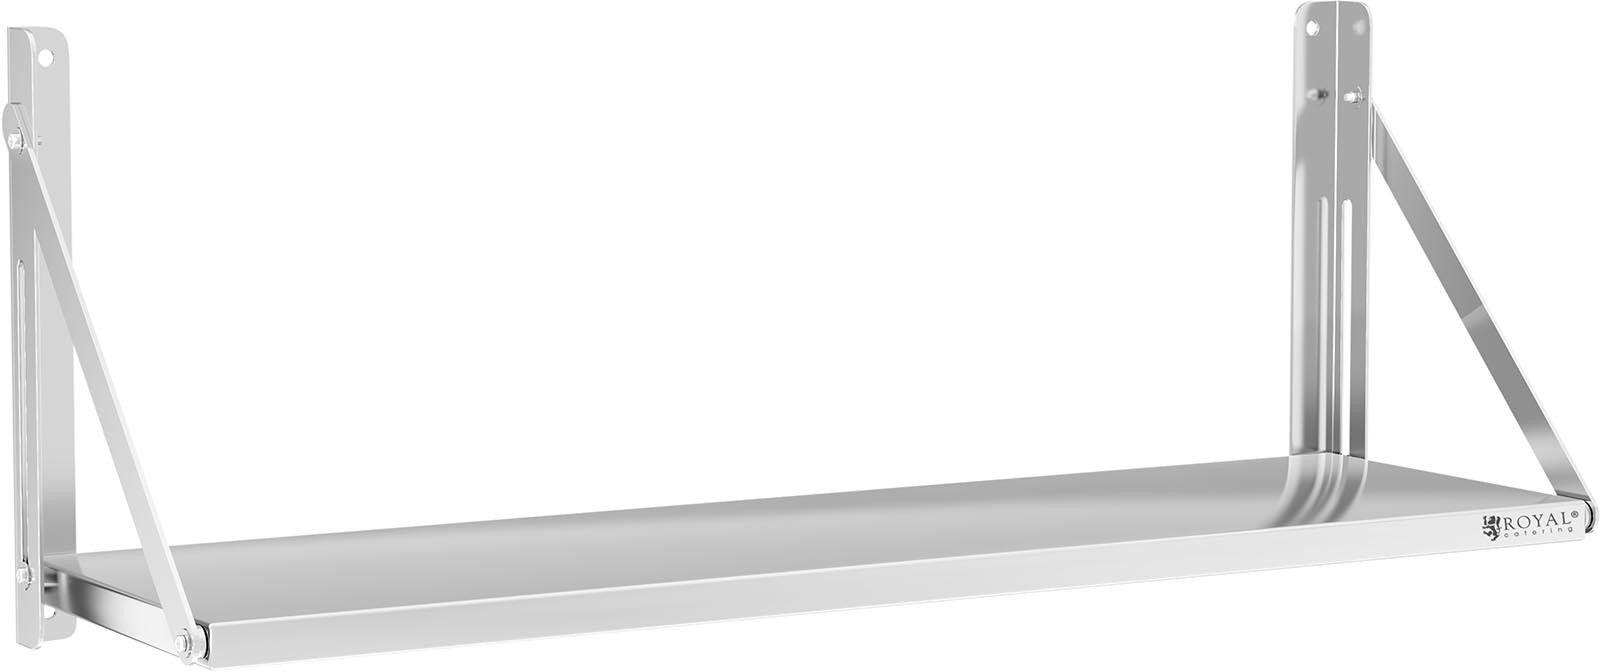 Półka składana - 120 x 30 cm ROYAL CATERING 10011713 RC-BFWH12030